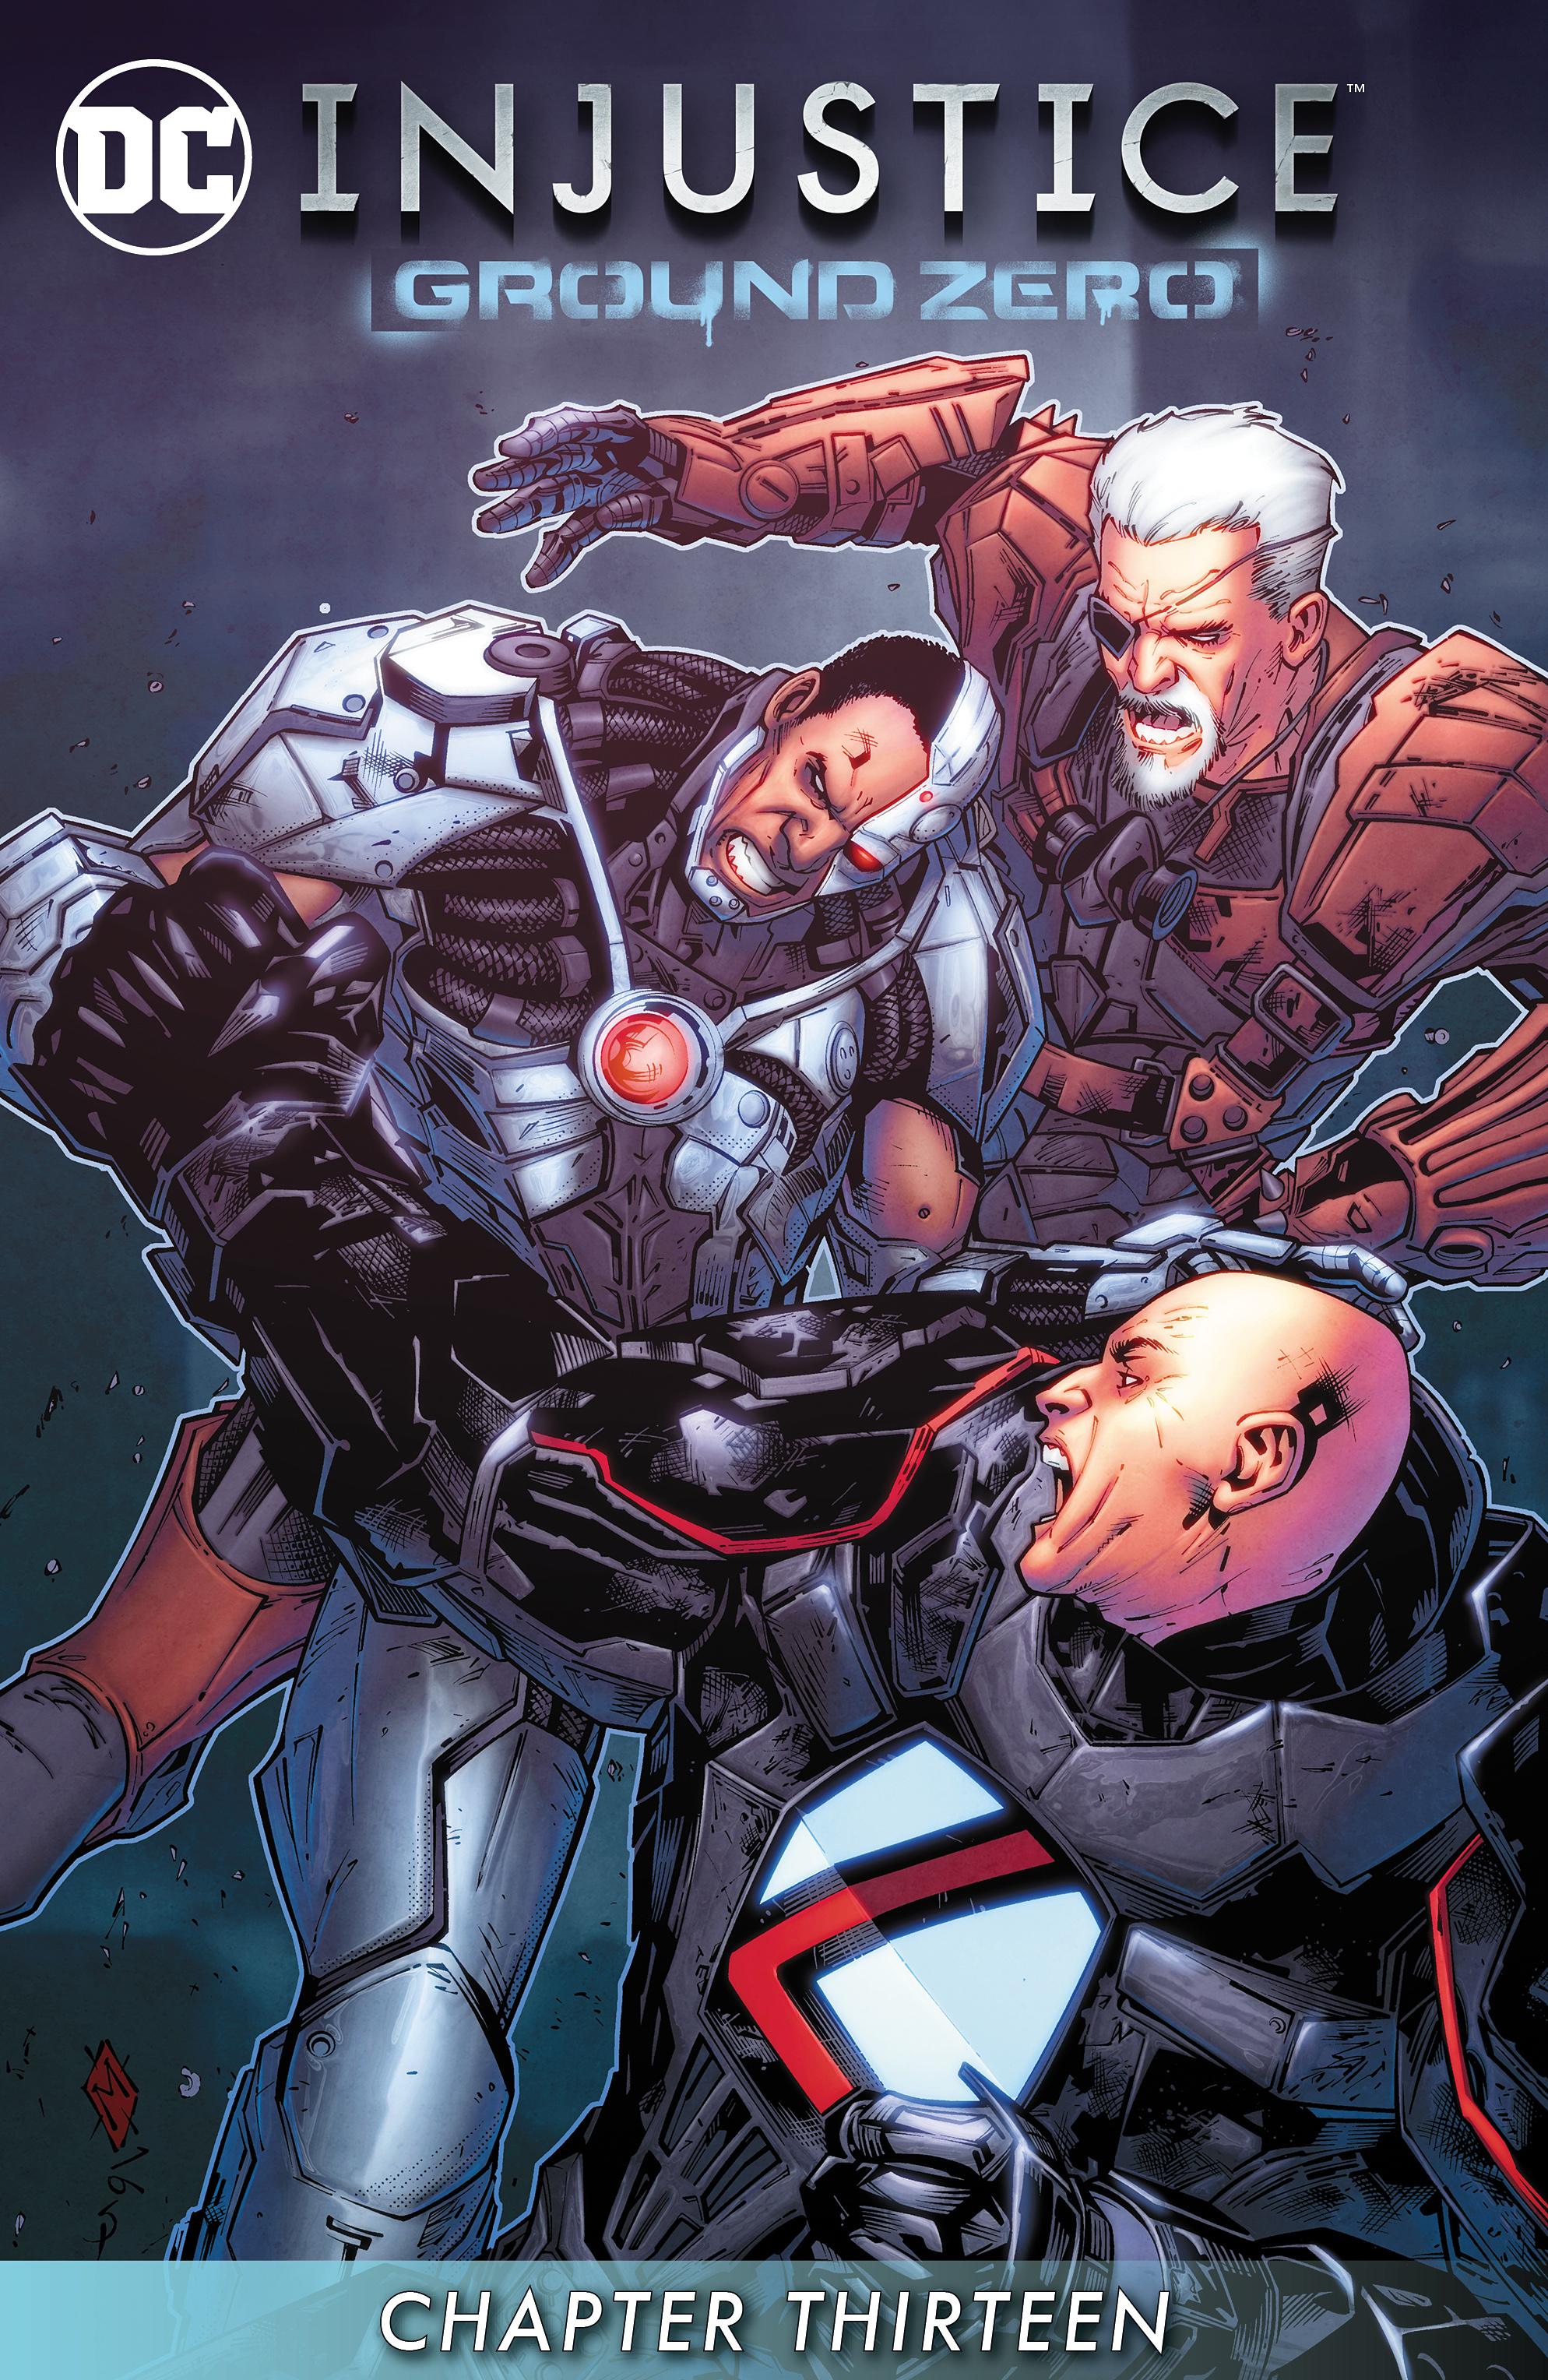 Read online Injustice: Ground Zero comic -  Issue #13 - 2